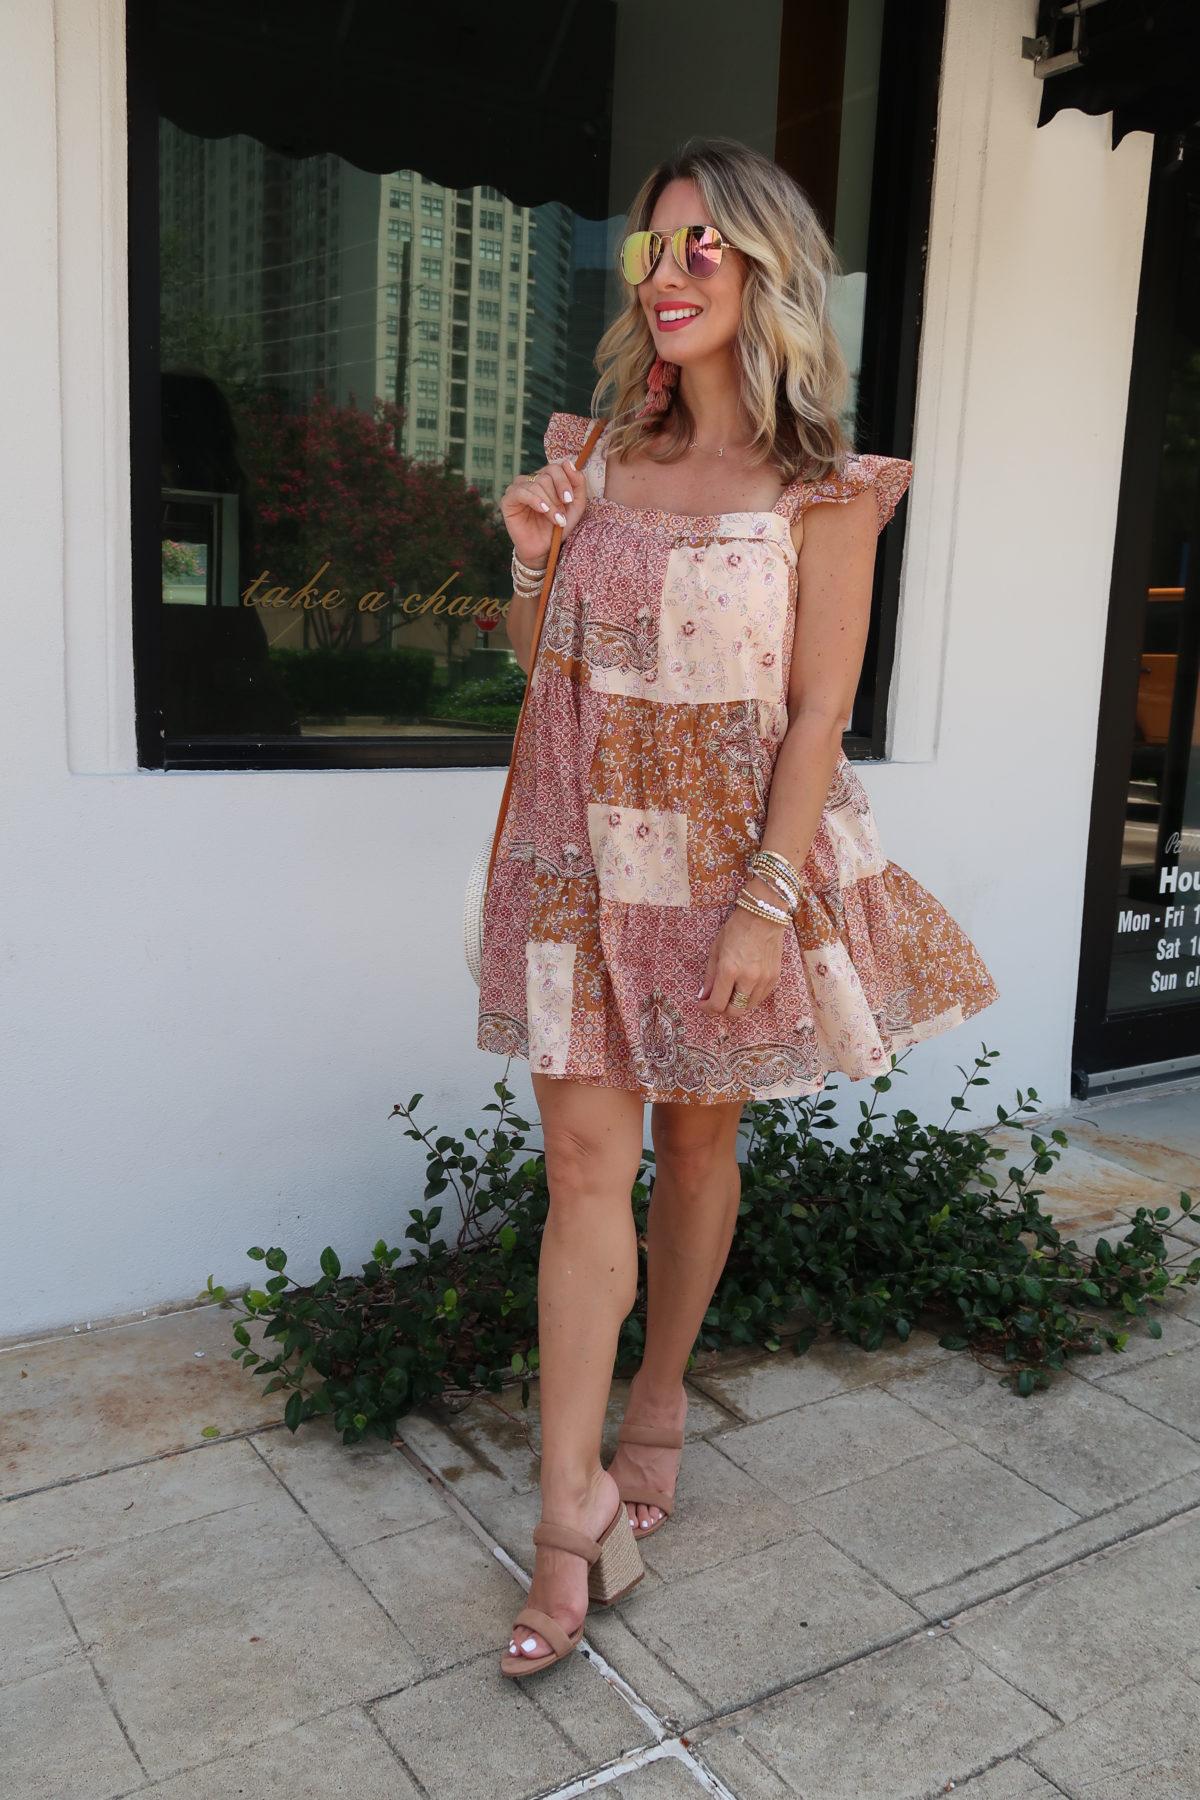 Flirty Summer Styles & Date Night Dresses,Boho Sytle Shift Dress, Sandals